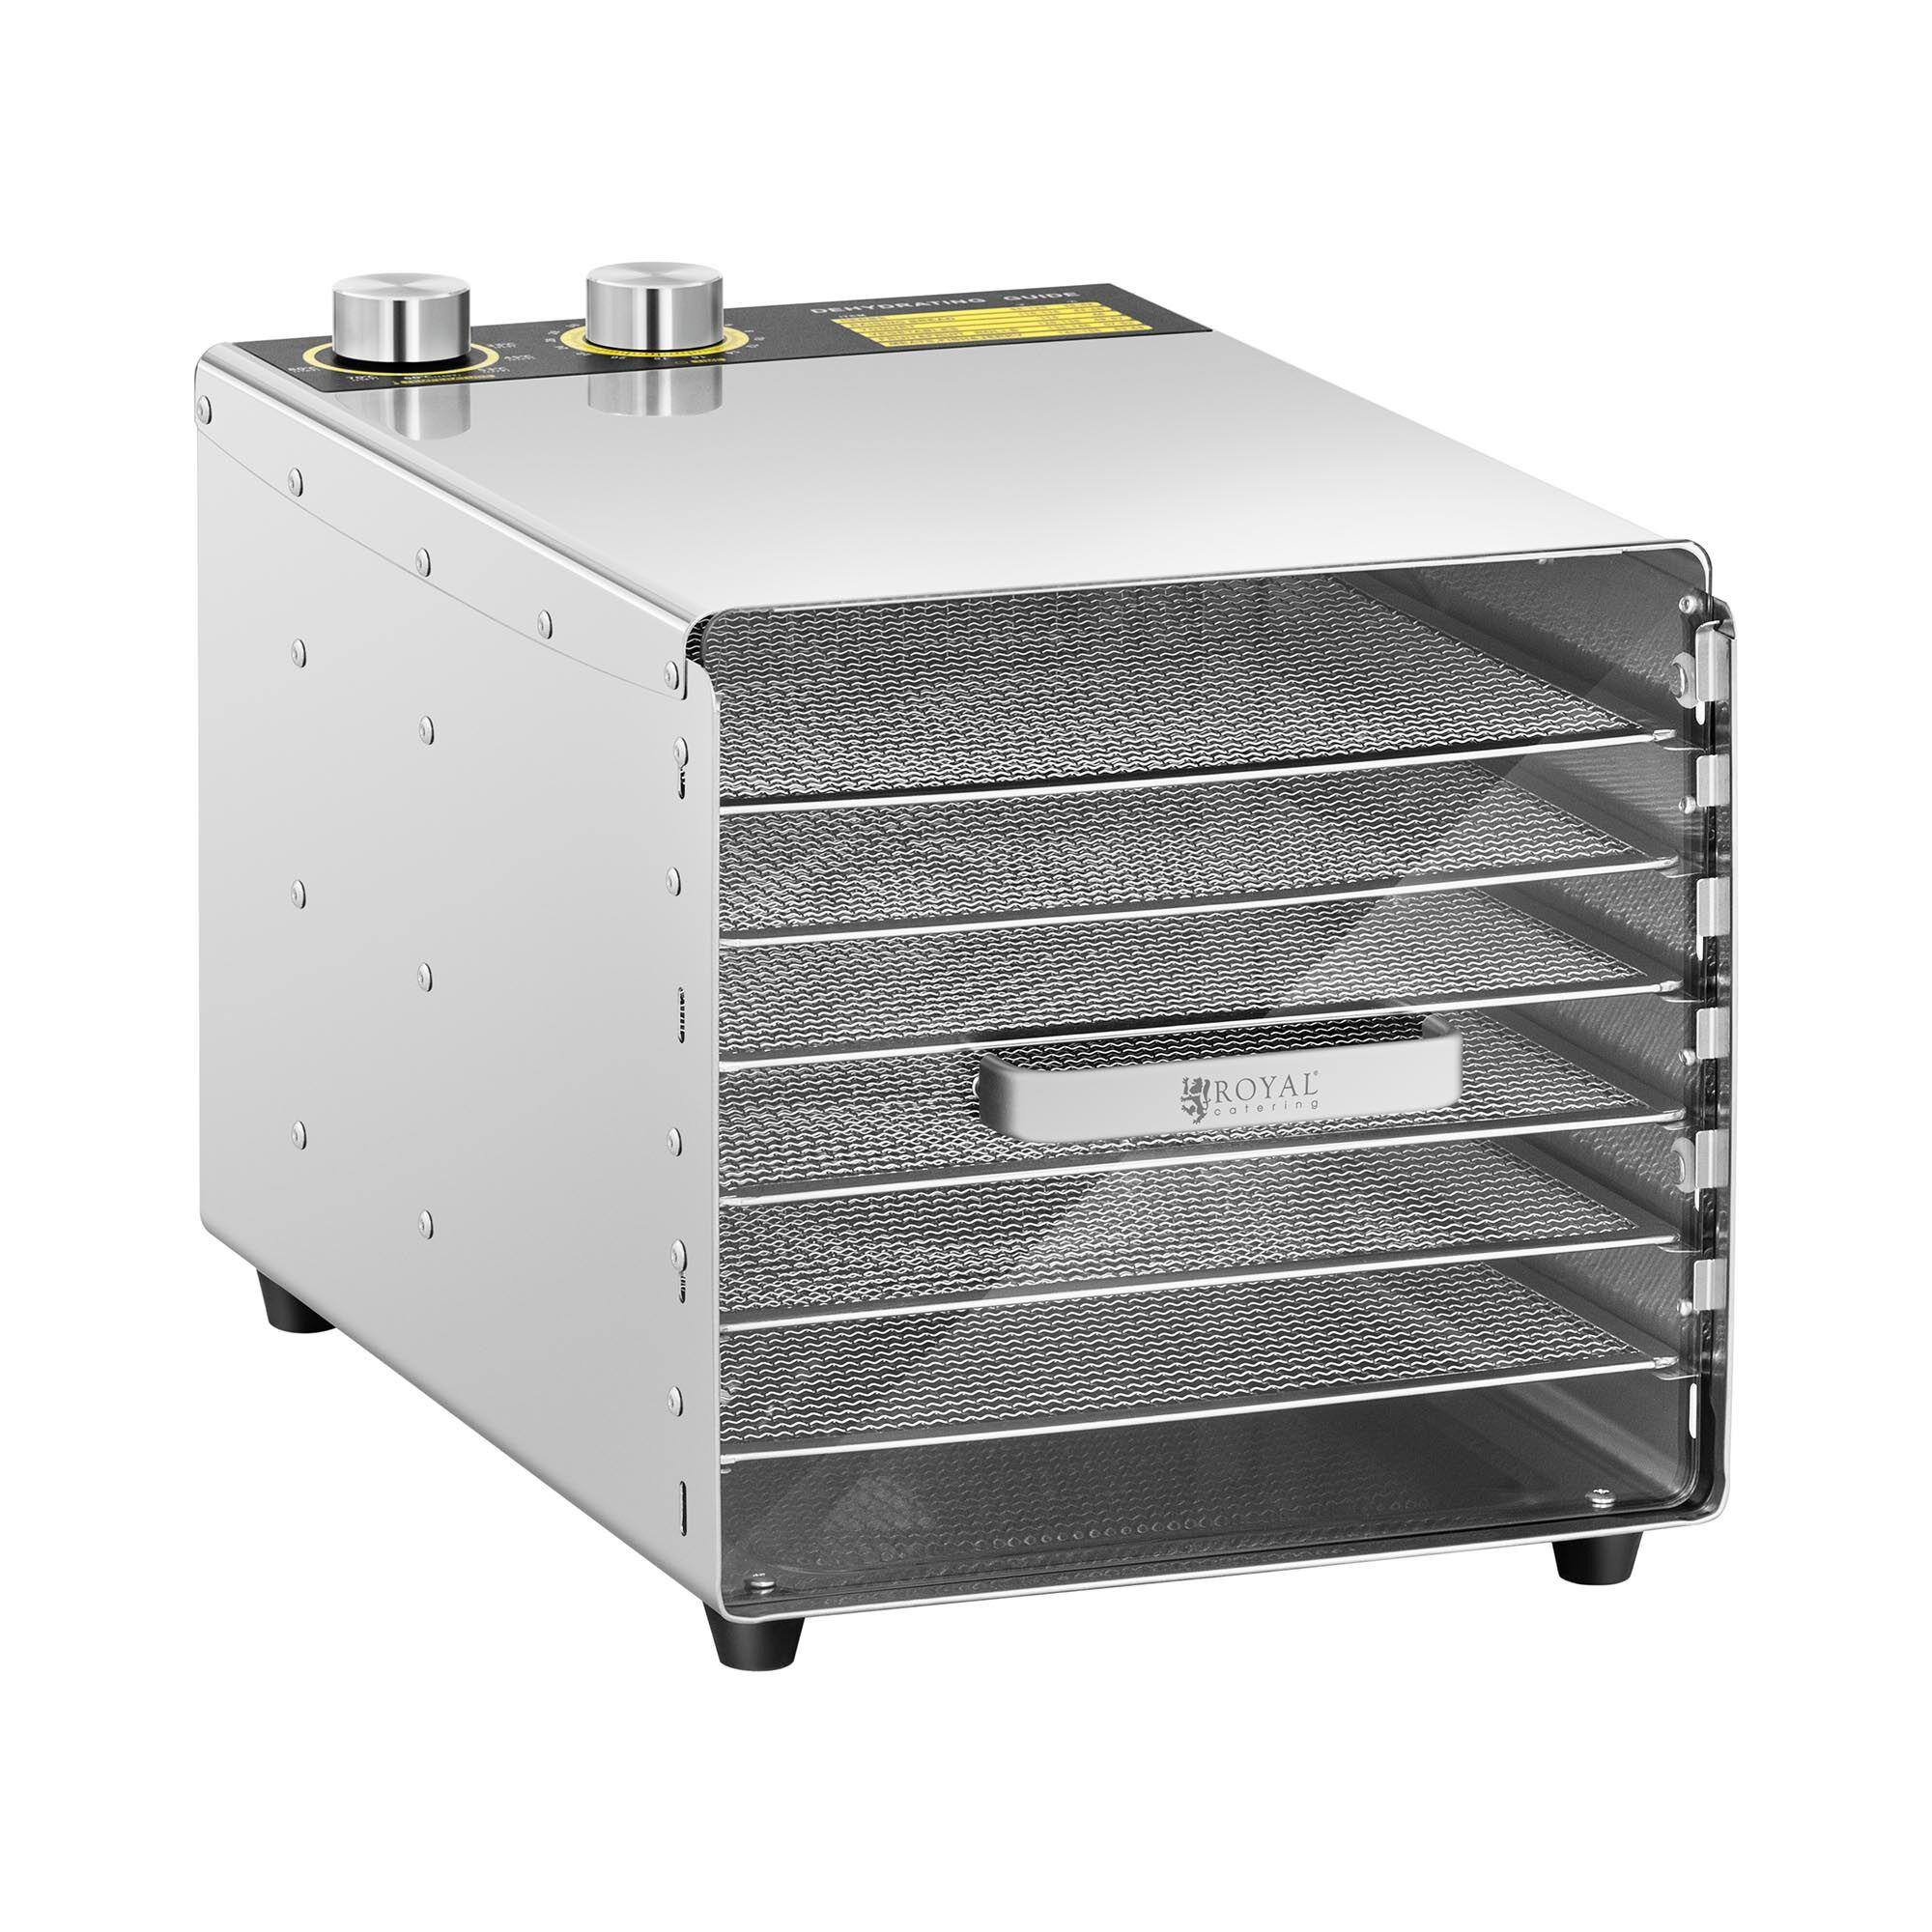 Royal Catering Déshydrateur alimentaire - 500 W - 6 étages RCDA-500/23S